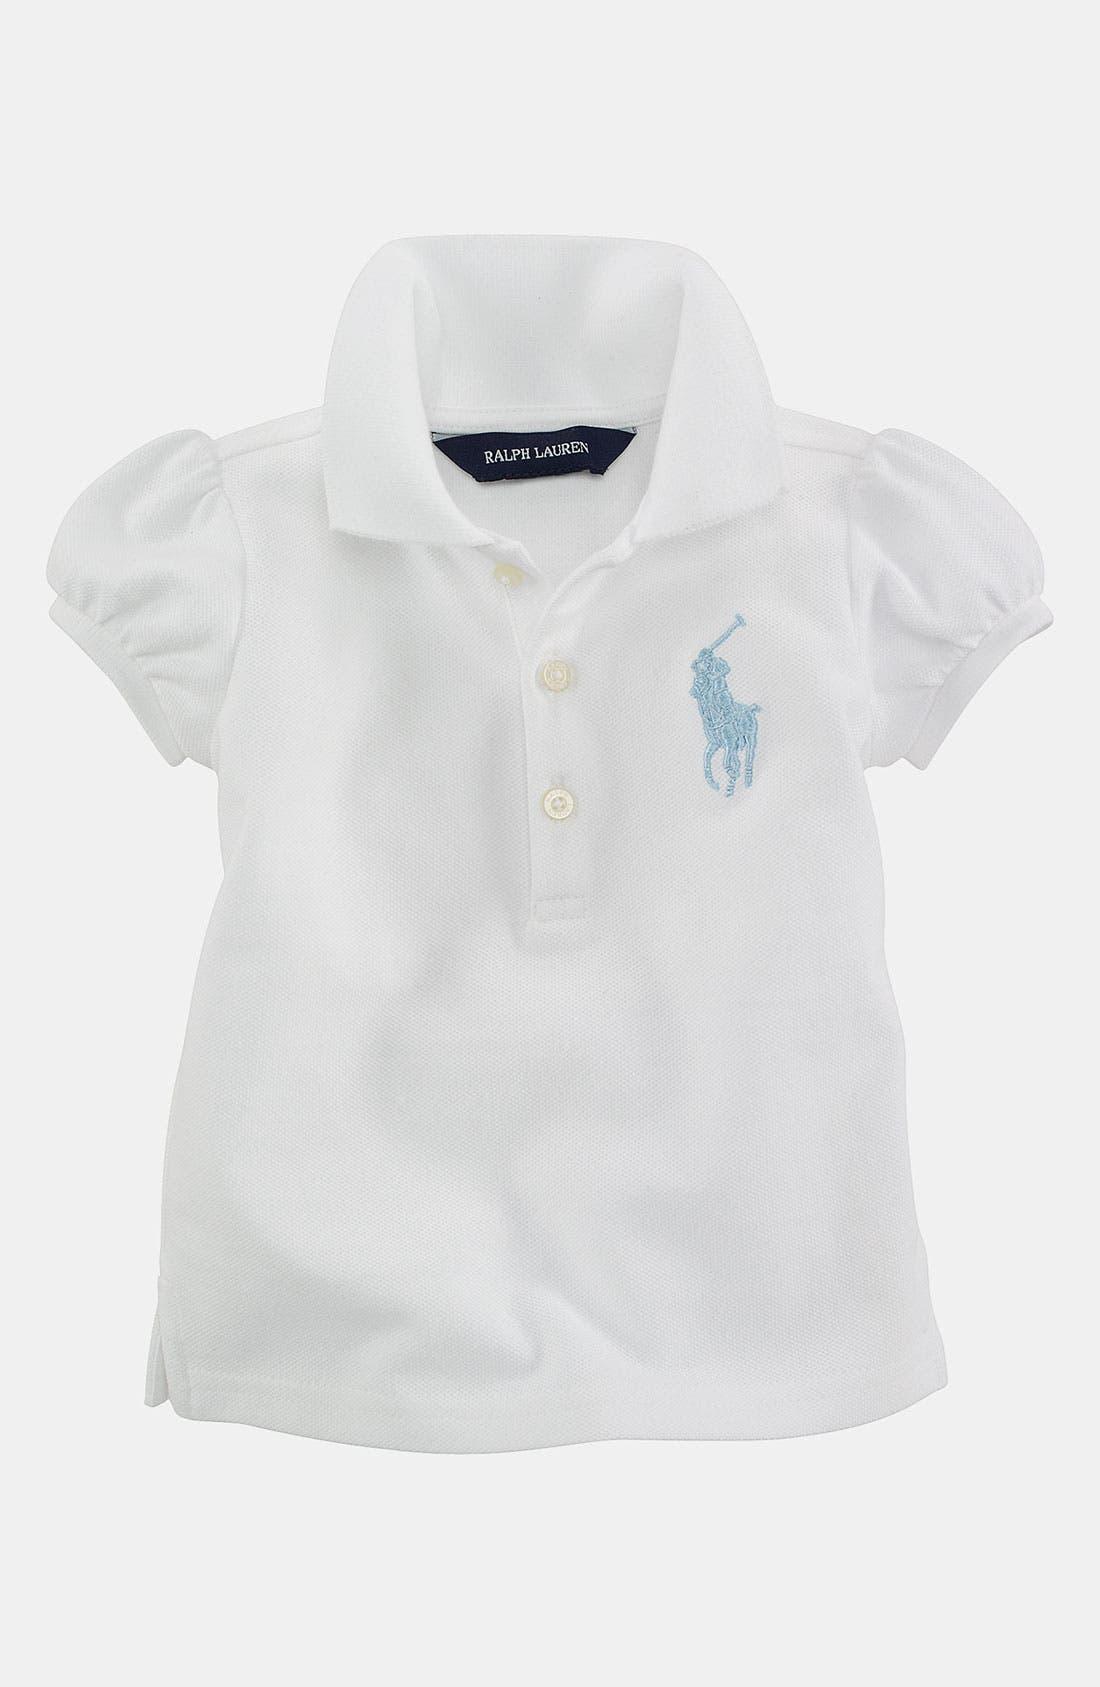 Alternate Image 1 Selected - Ralph Lauren Polo Shirt (Infant)